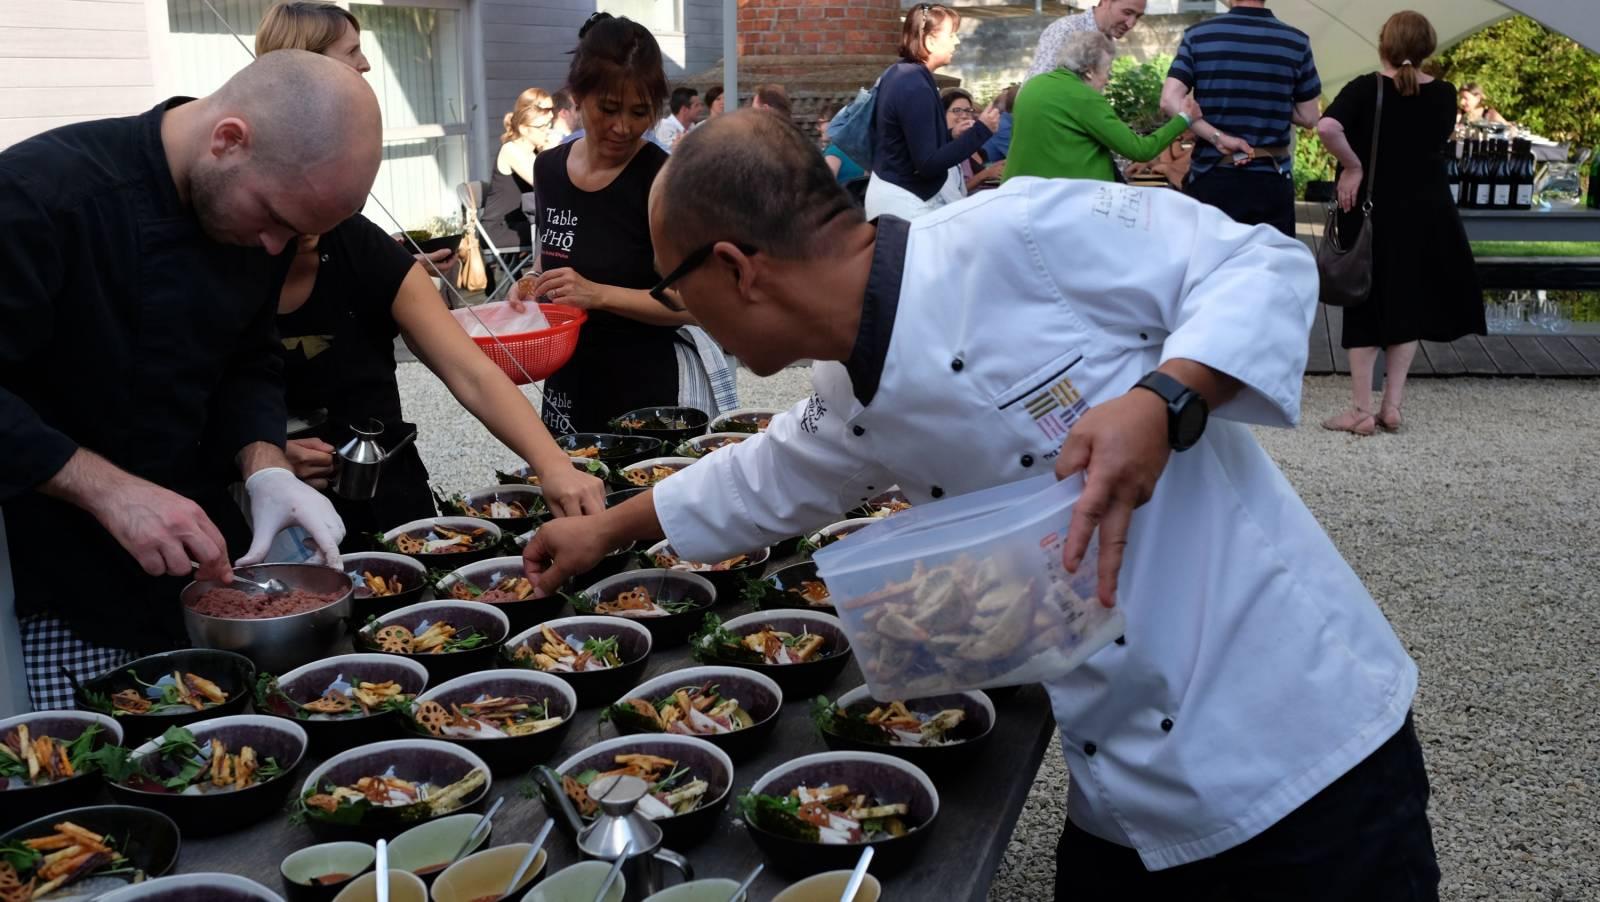 Table d'Ho - foodtruck - House of Weddings 3 - 2